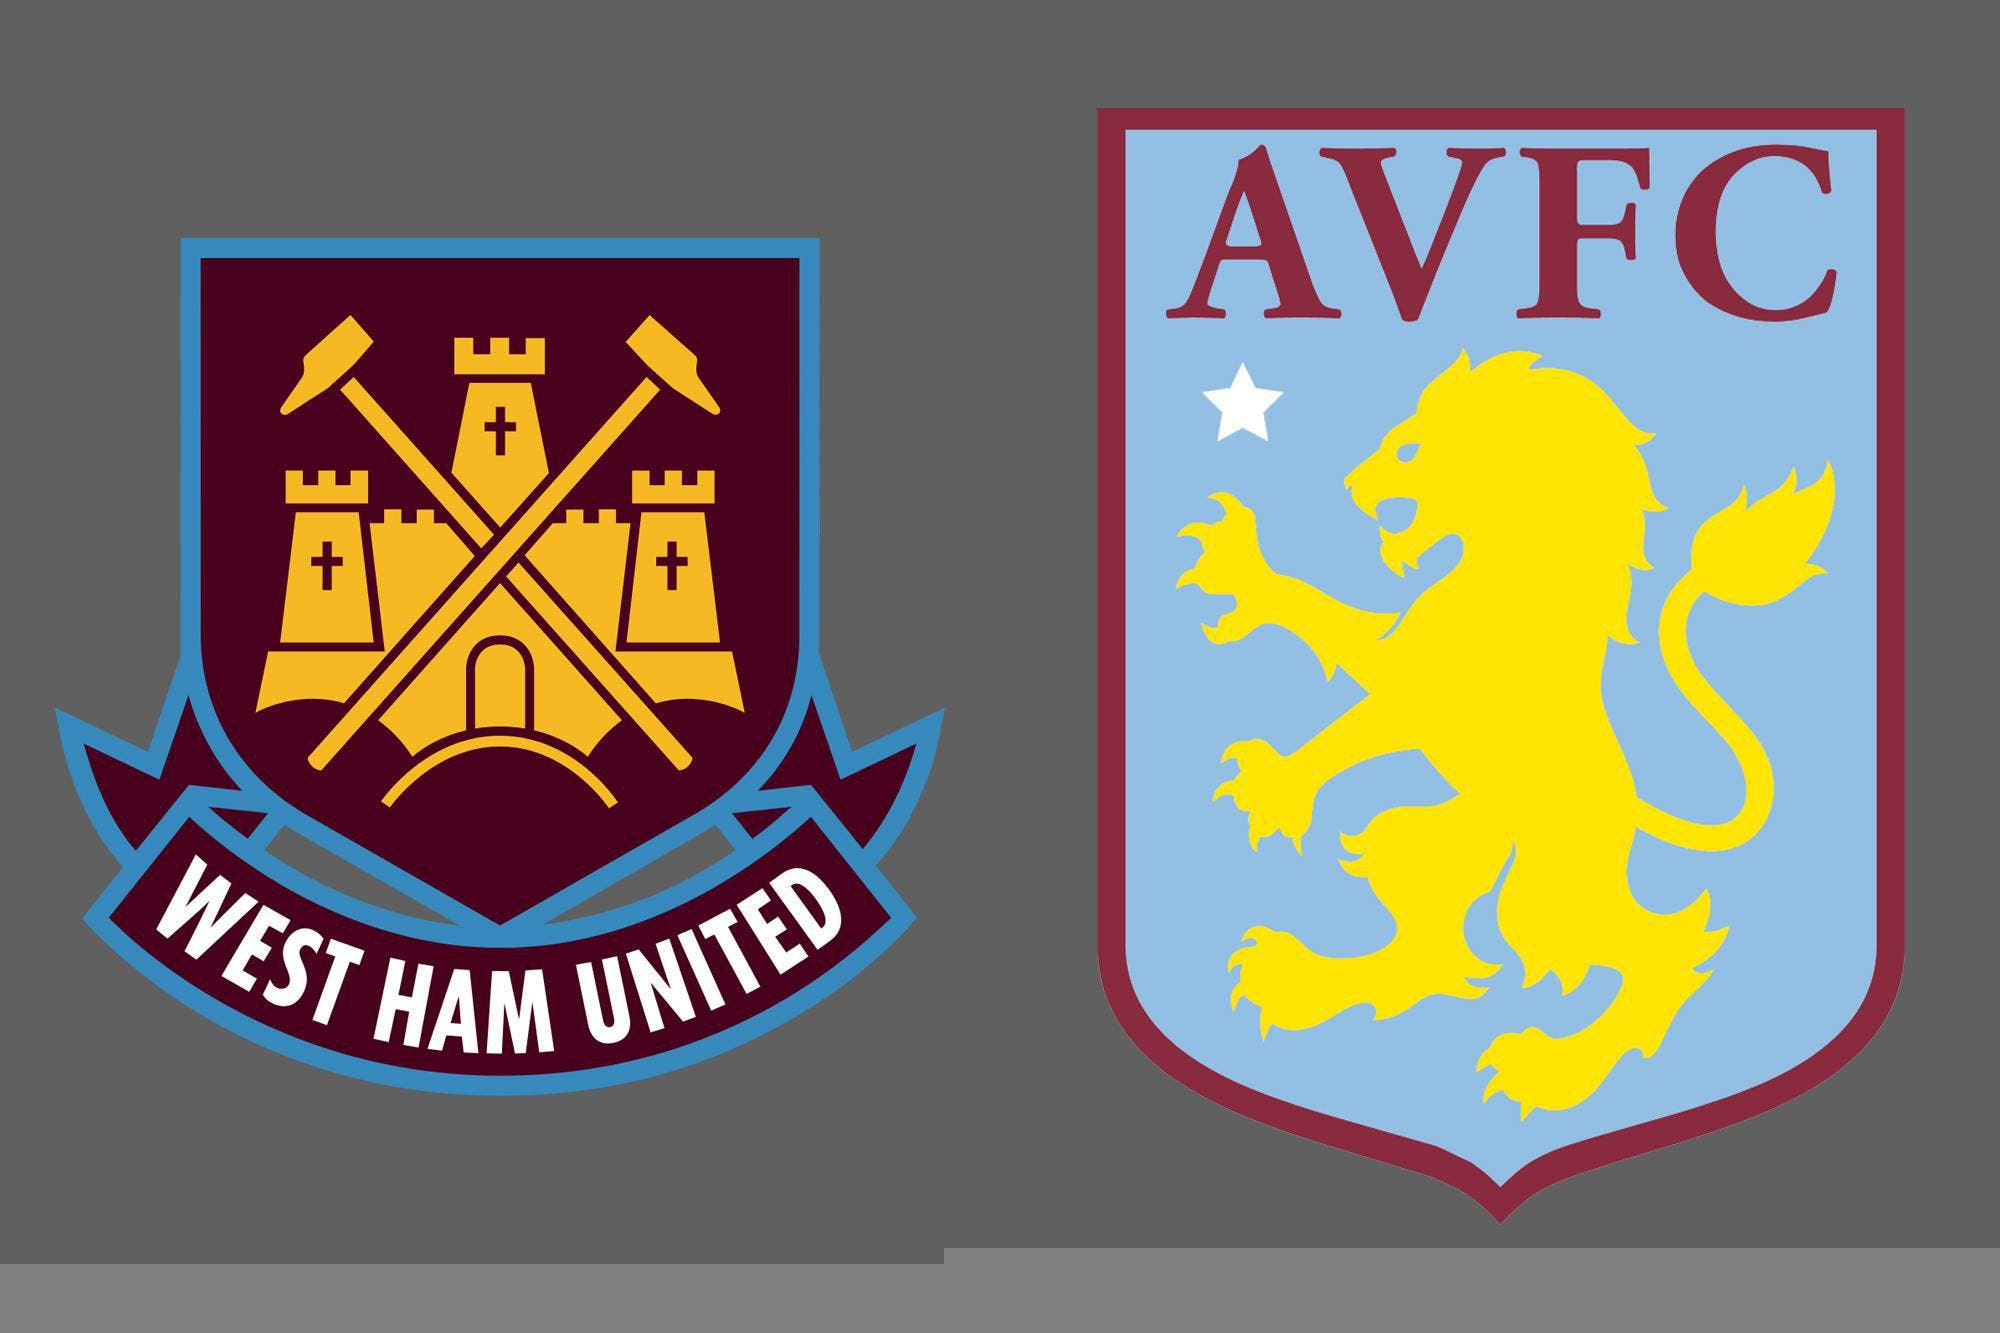 Premier League de Inglaterra: West Ham United venció por 2-1 a Aston Villa como local